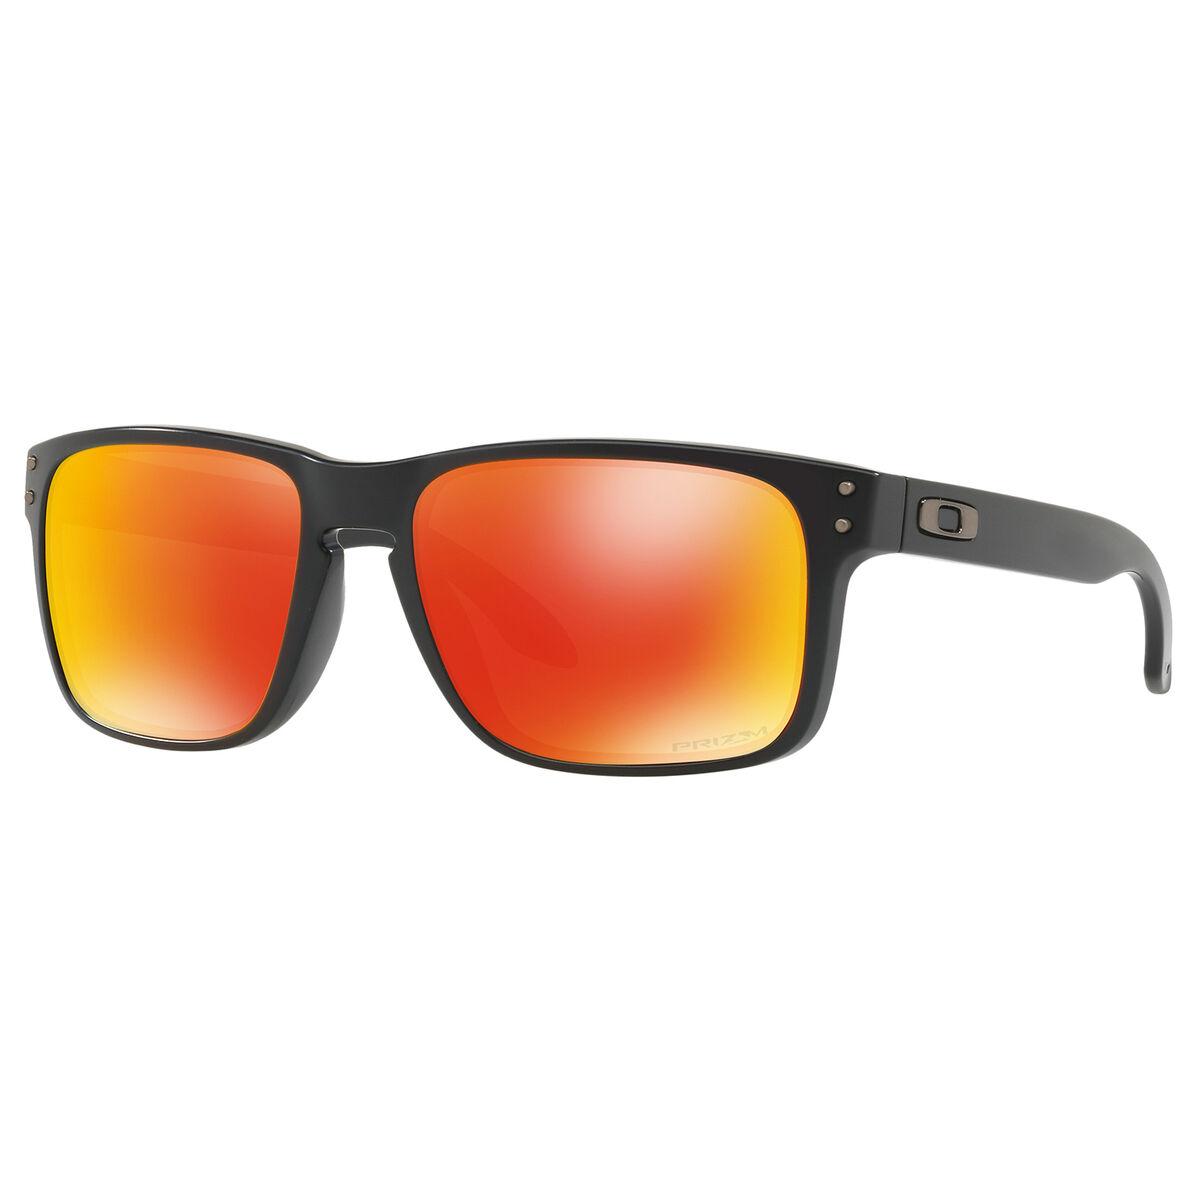 41d95400304b Images. Oakley Holbrook Prizm Polarized Sunglasses